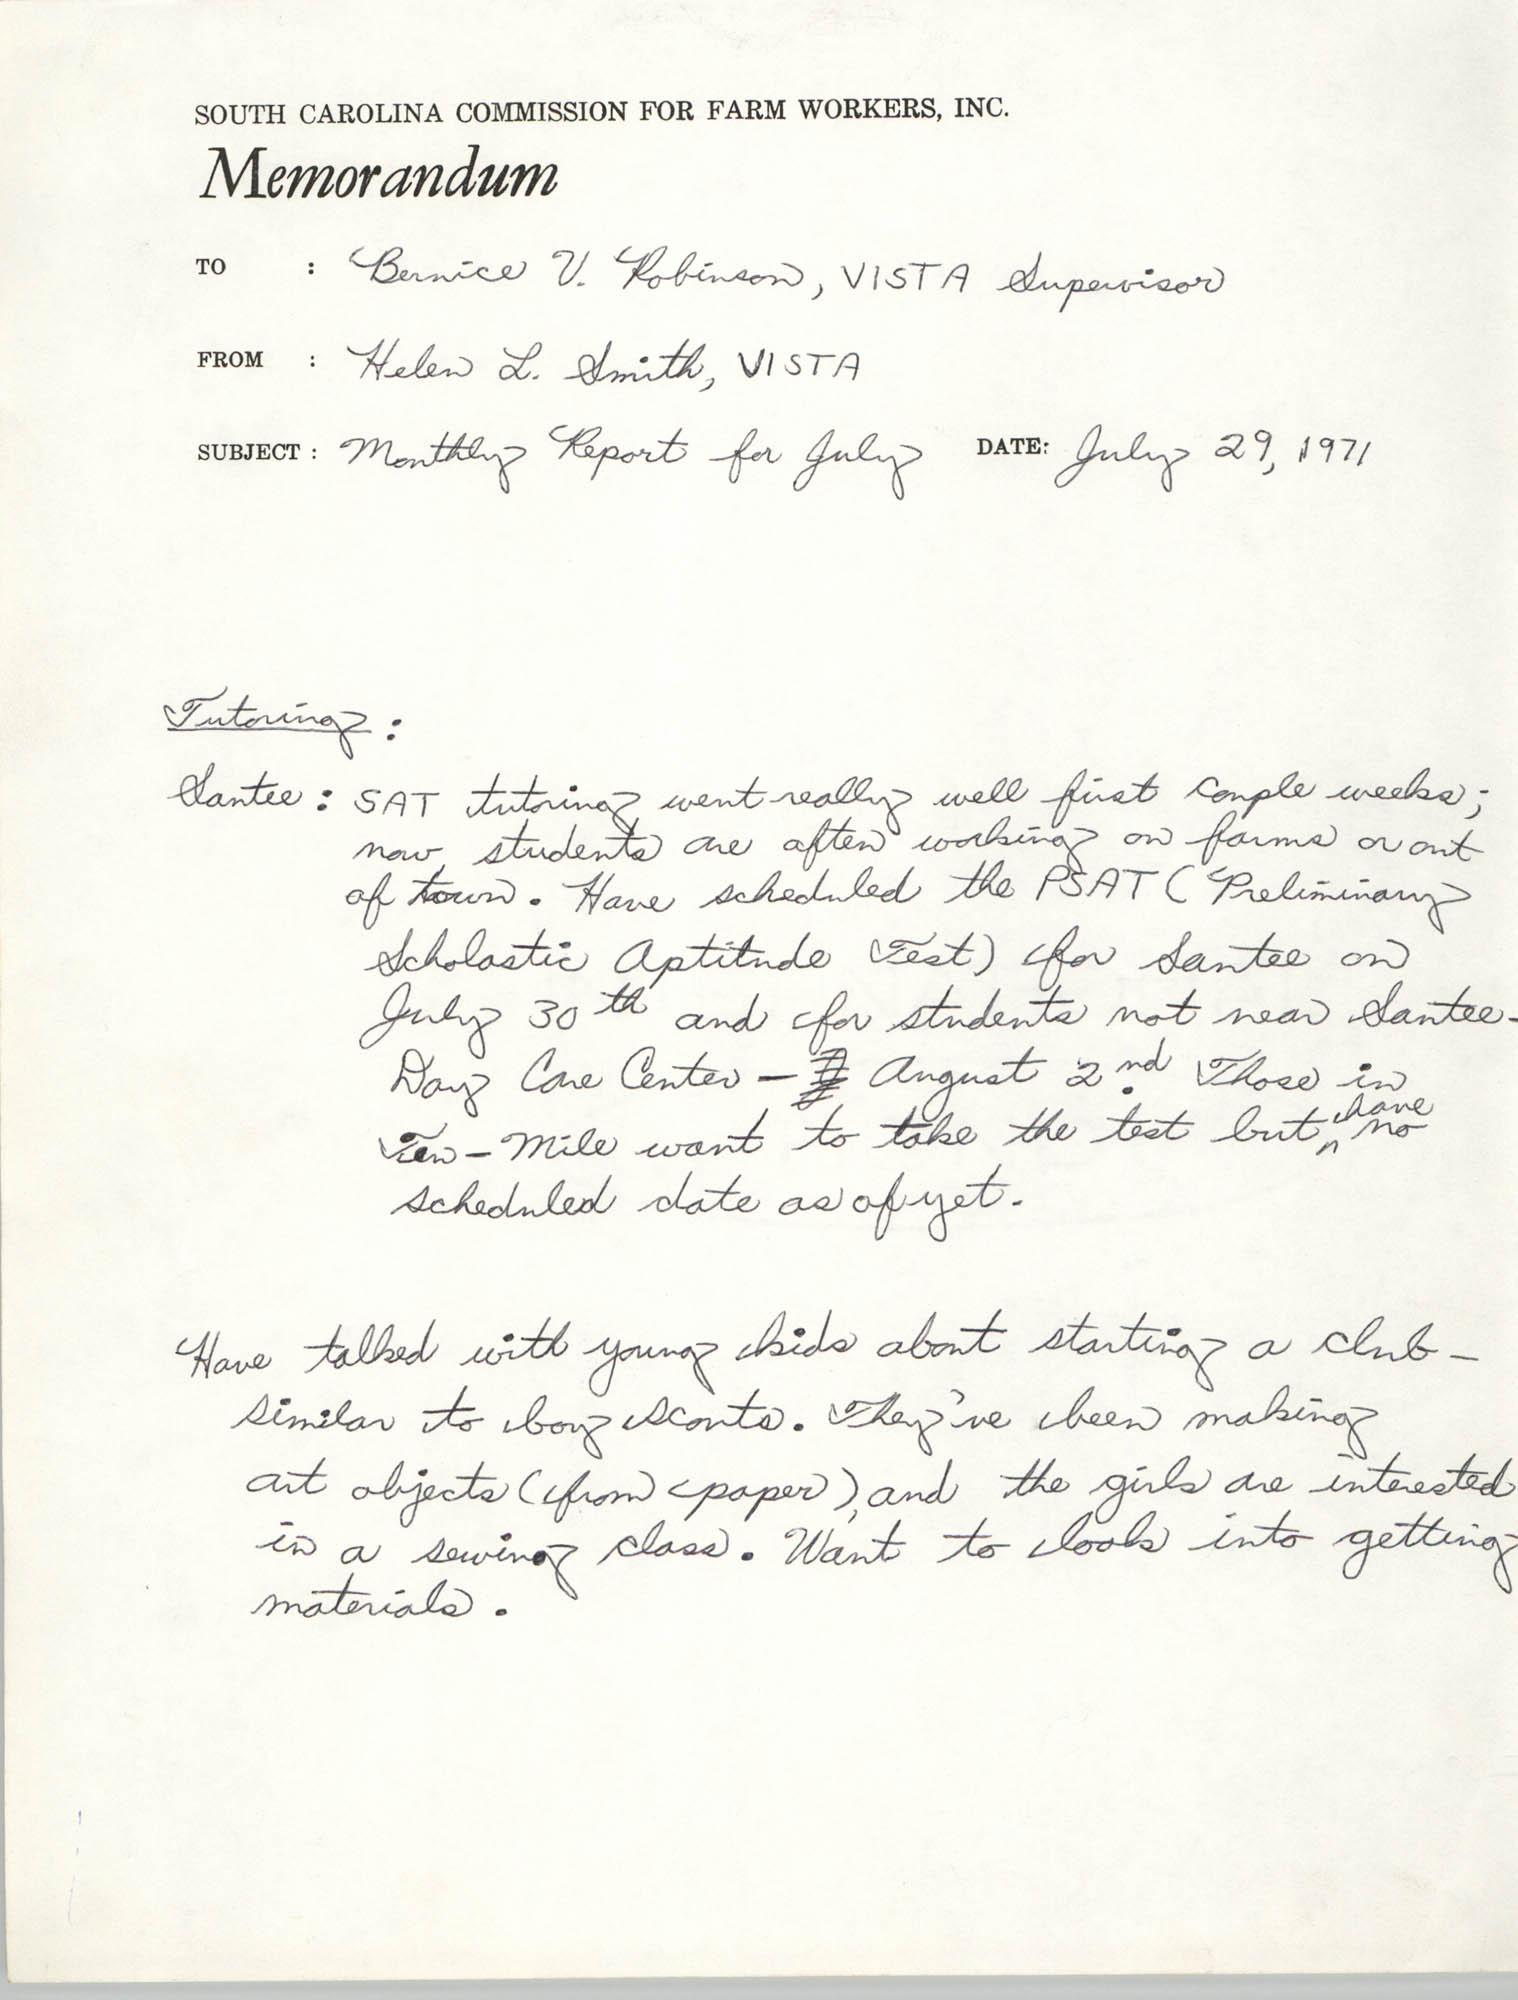 Memorandum from Helen L. Smith to Bernice Robinson, July 1971